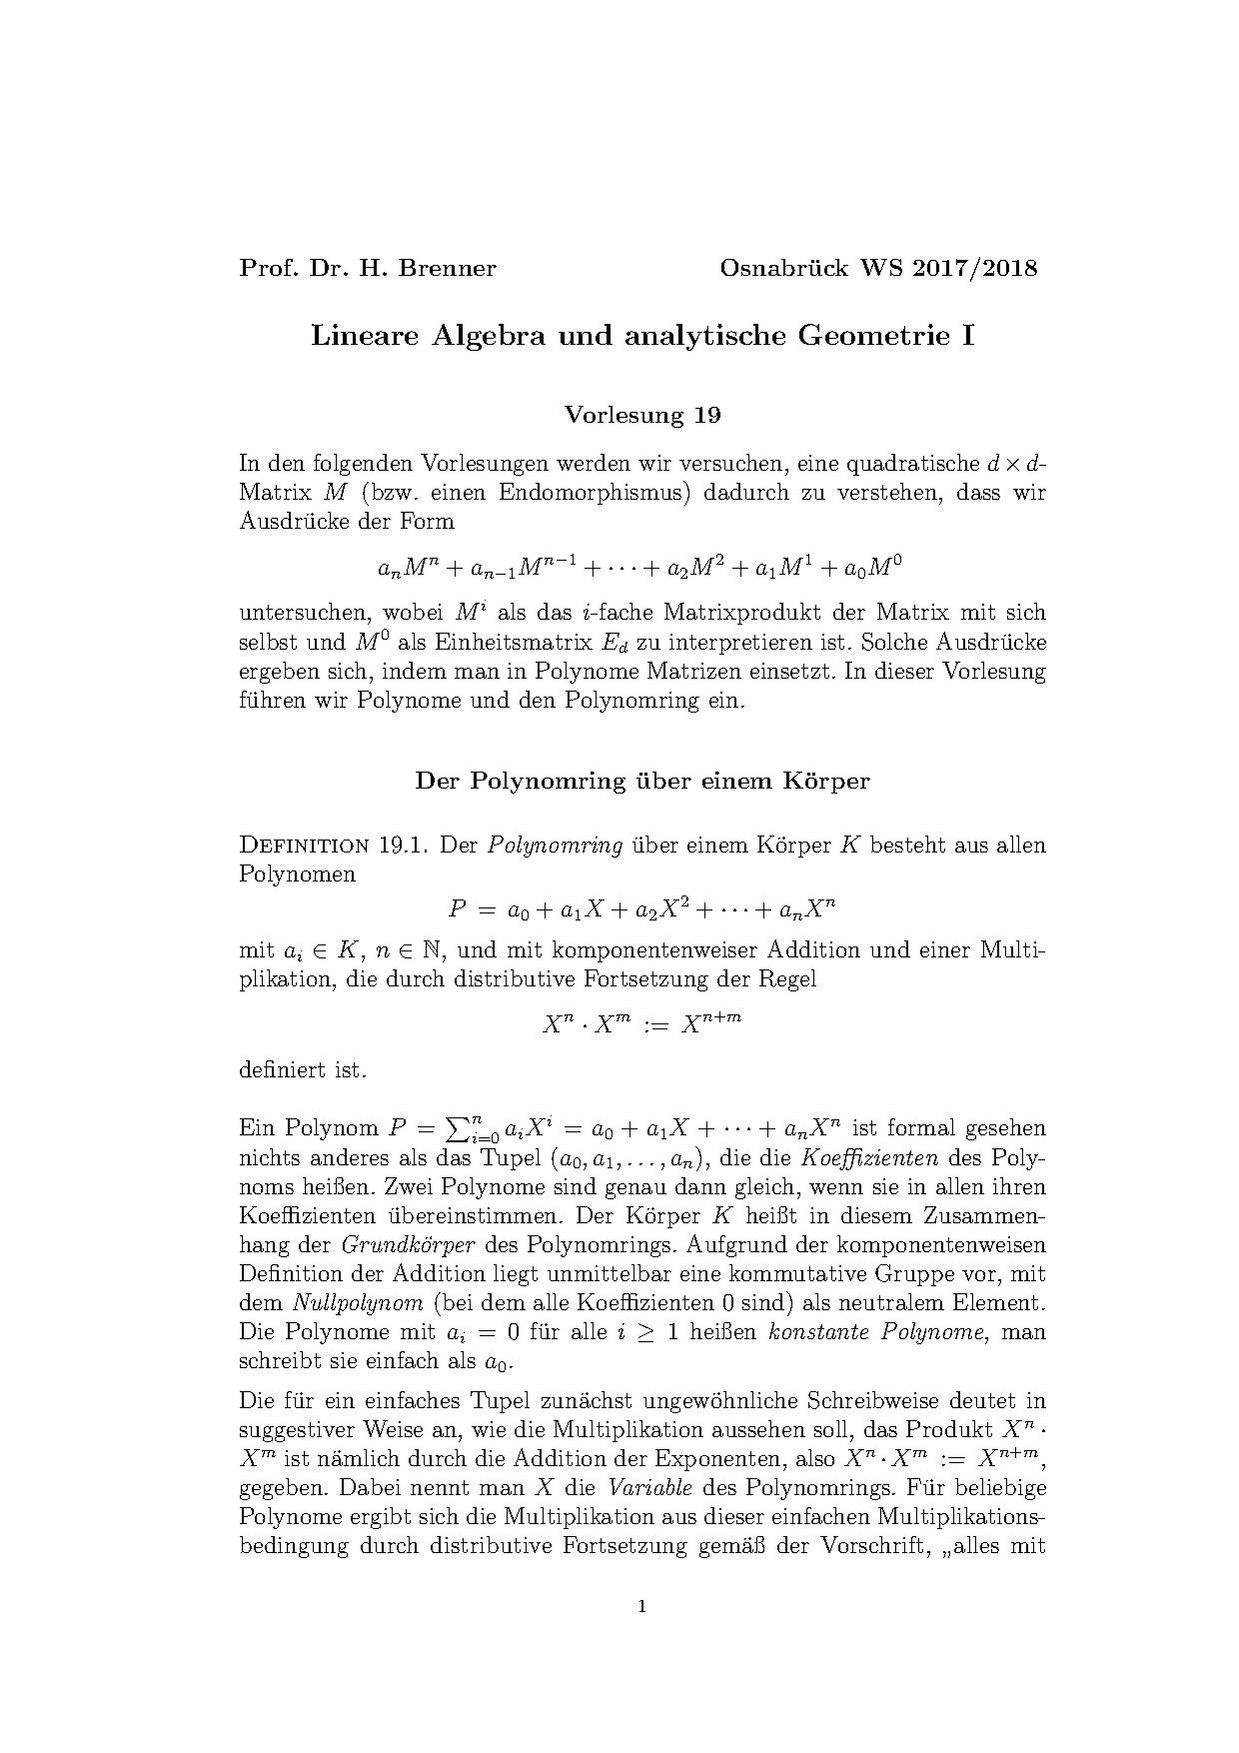 File:Lineare Algebra (Osnabrück 2017-2018)Teil IVorlesung19.pdf ...